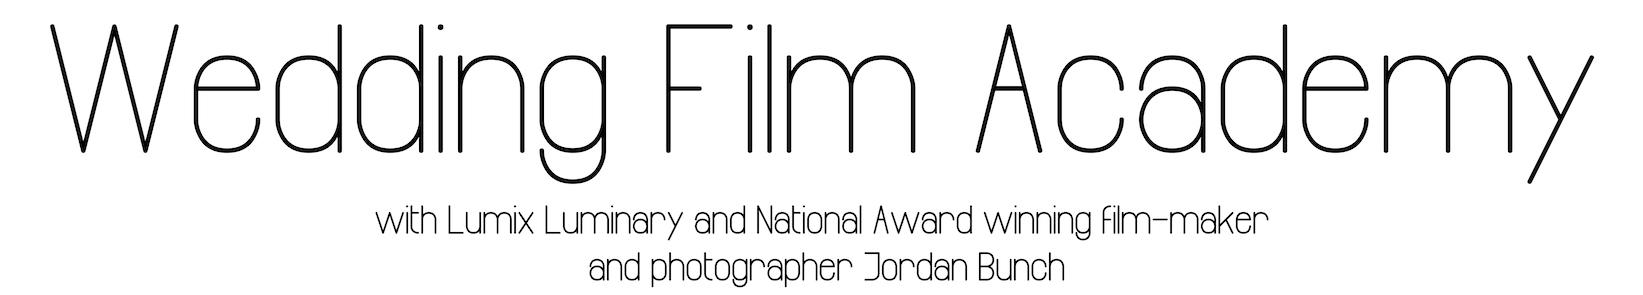 Learn Digital Storytelling with Lumix Luminary & National Award Winning Film-Maker & Photographer Jordan Bunch